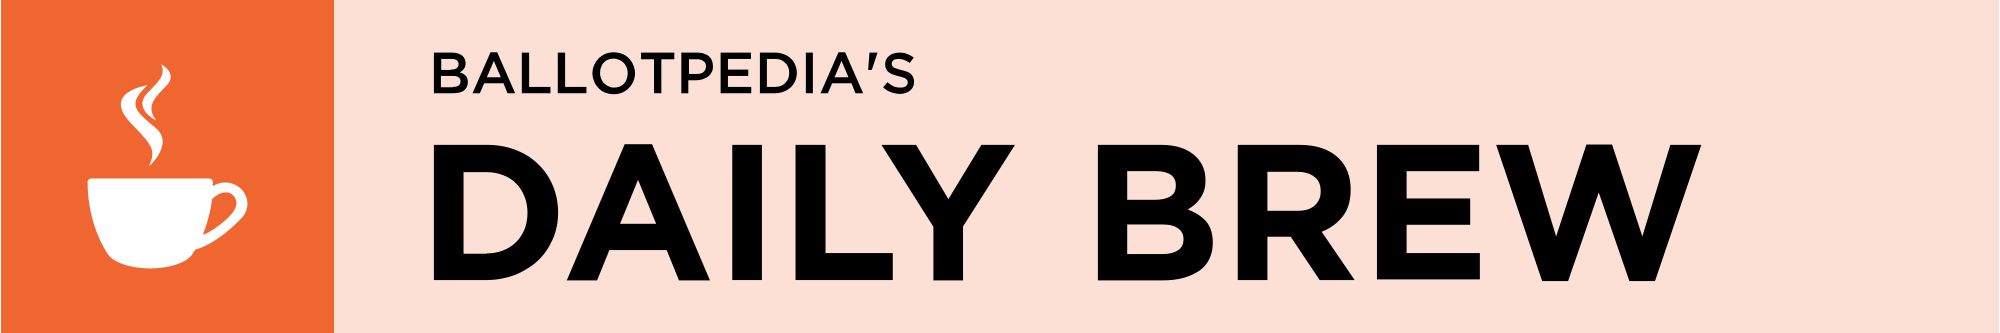 Ballotpedia's Daily Brew